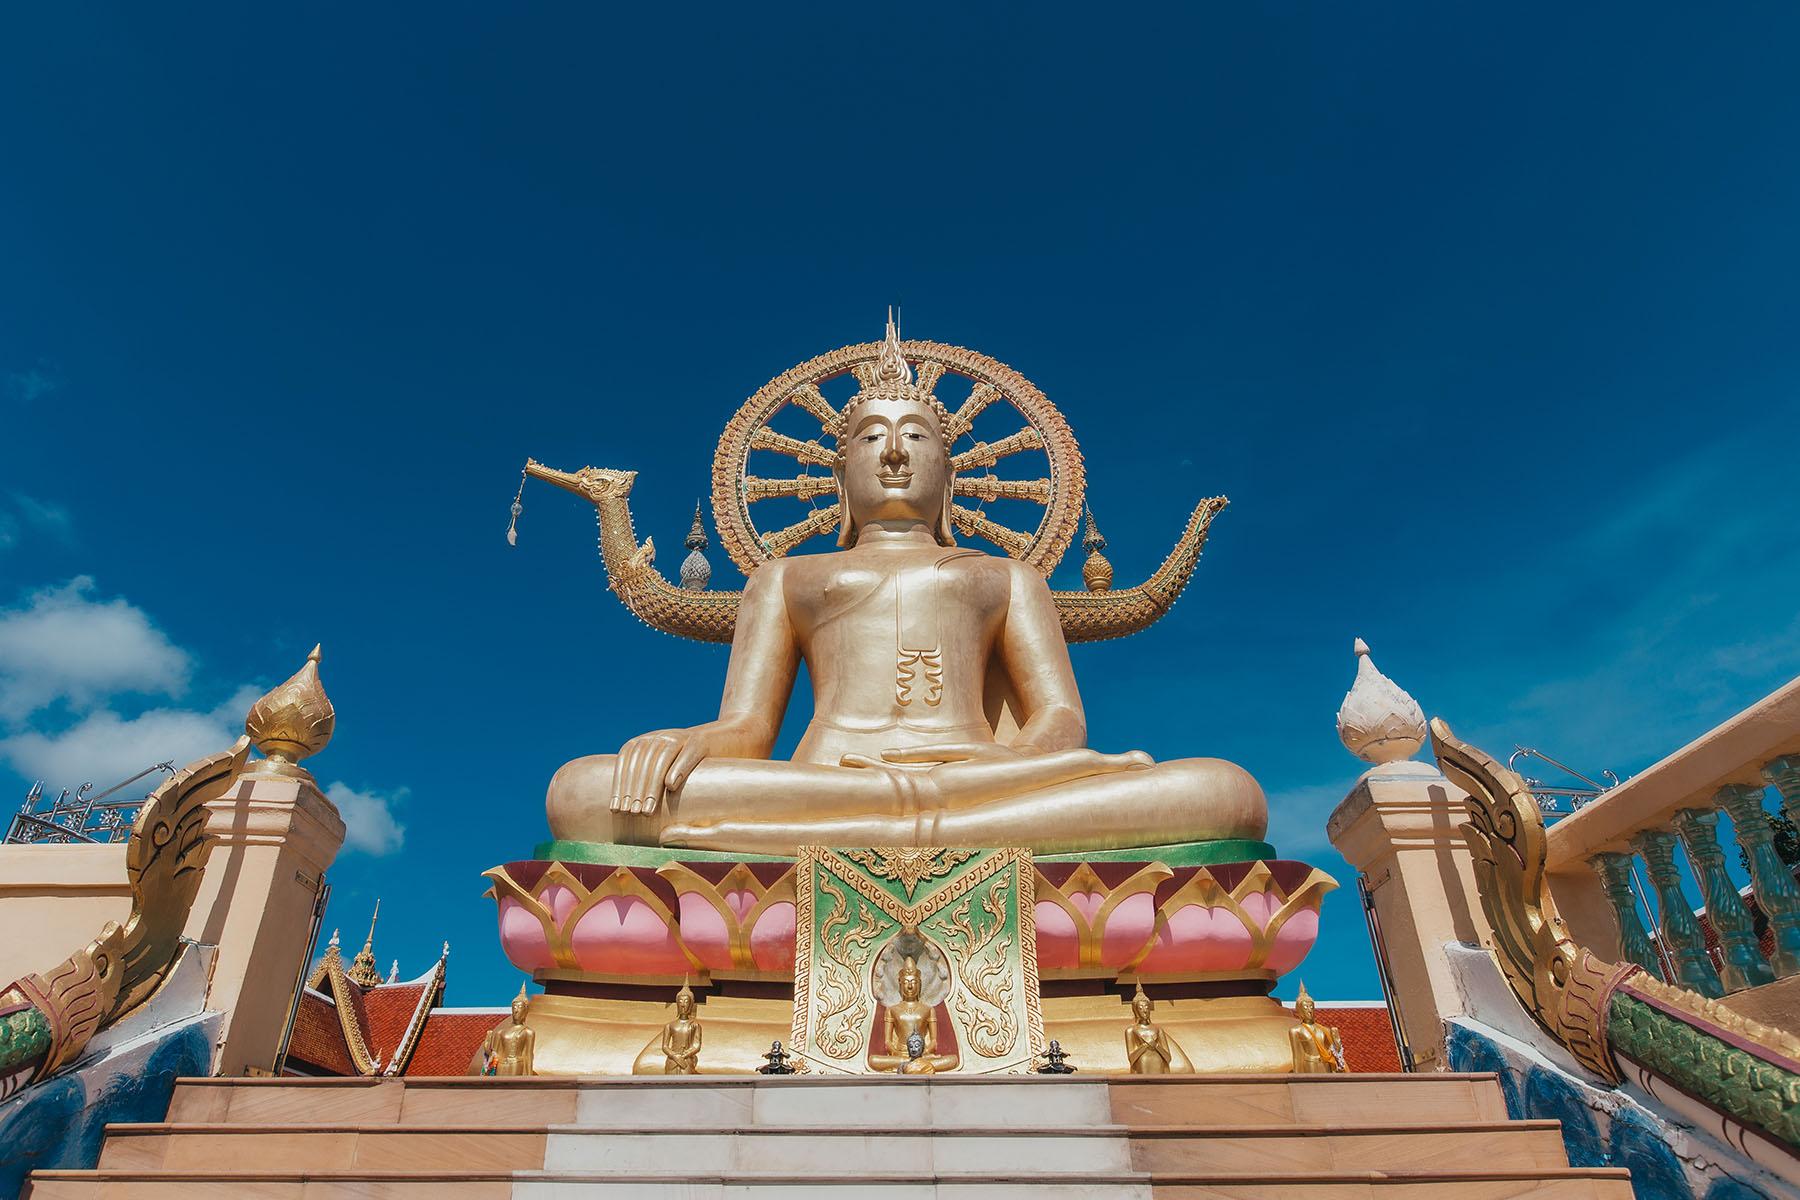 Abbildung Big Buddha Statue am Wat Phra Yai Tempel auf Koh Samui